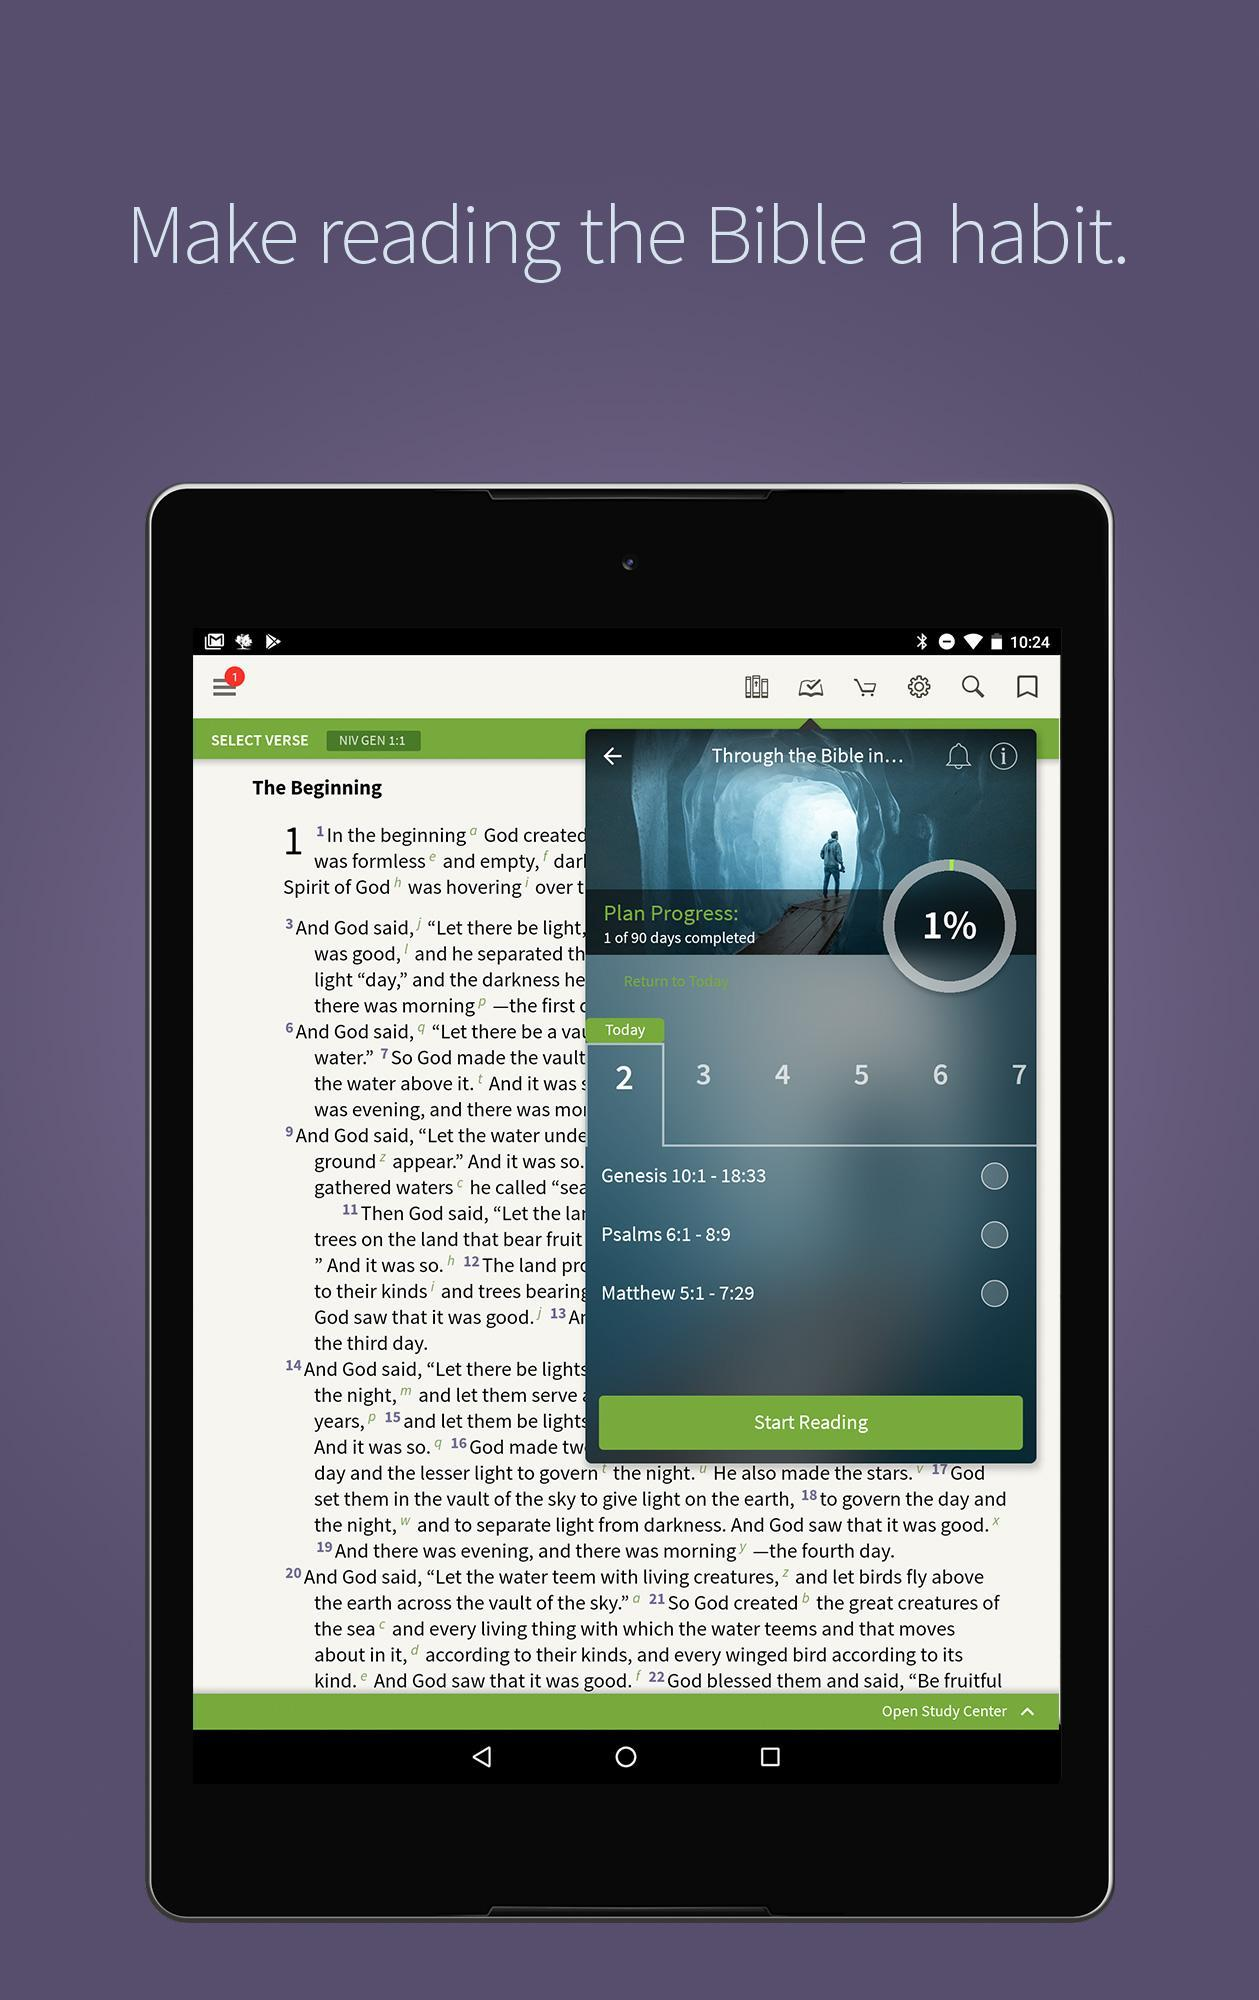 Bible App by Olive Tree 7.5.4.0.5664 Screenshot 12